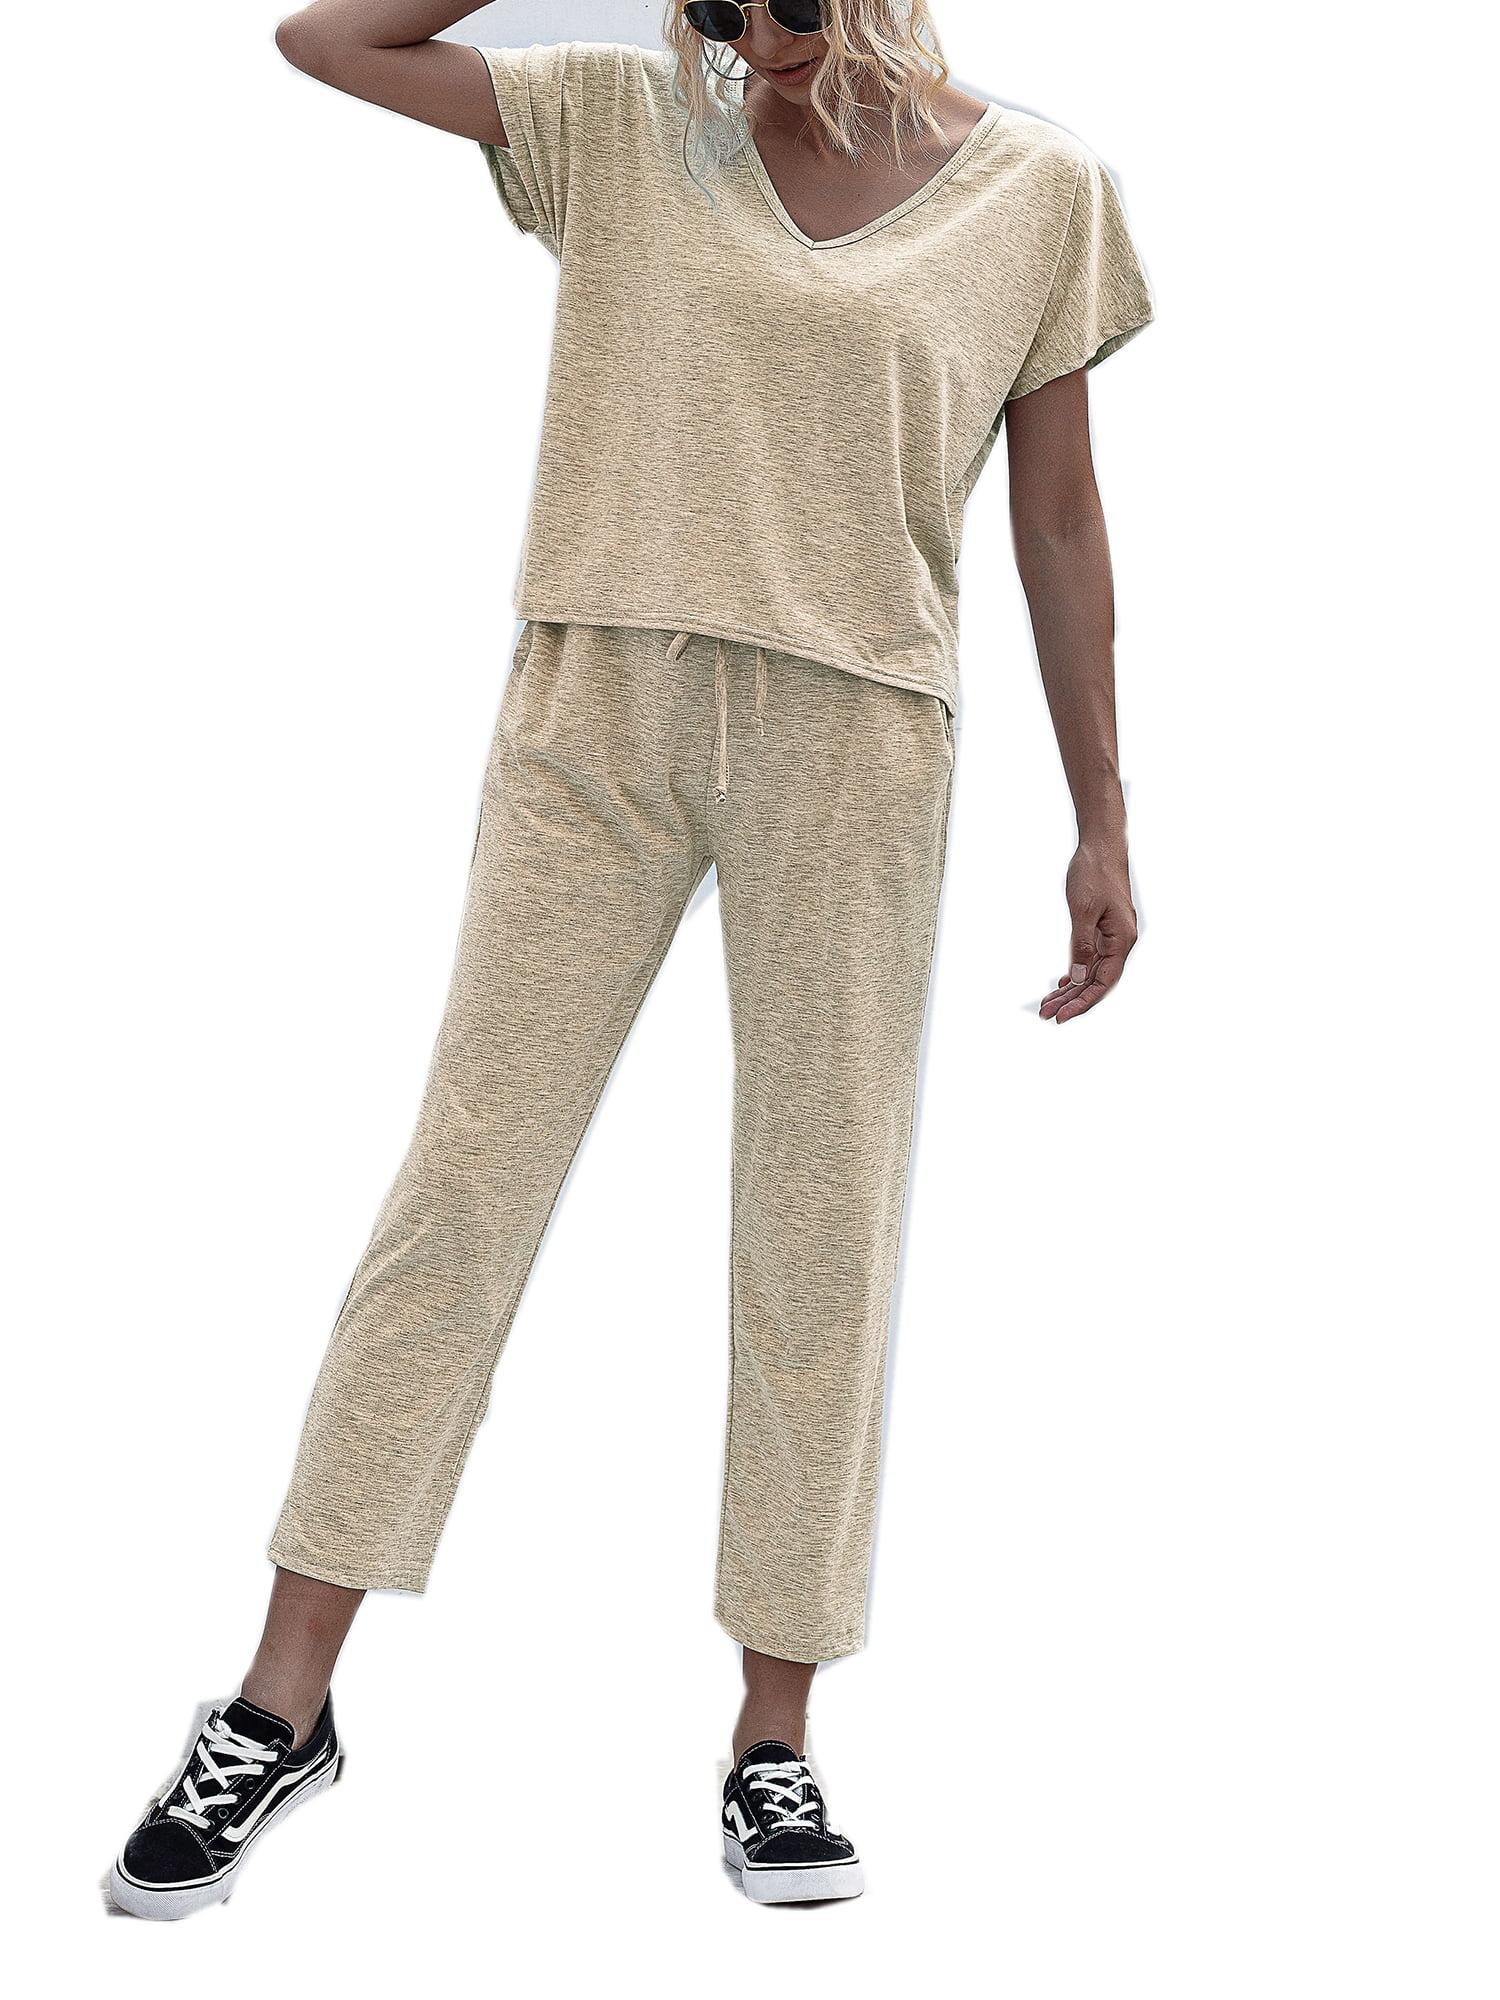 Women 2PCS Tracksuits Set Loungewear Ladies Hoodies Top Pants Lounge Wear Suit